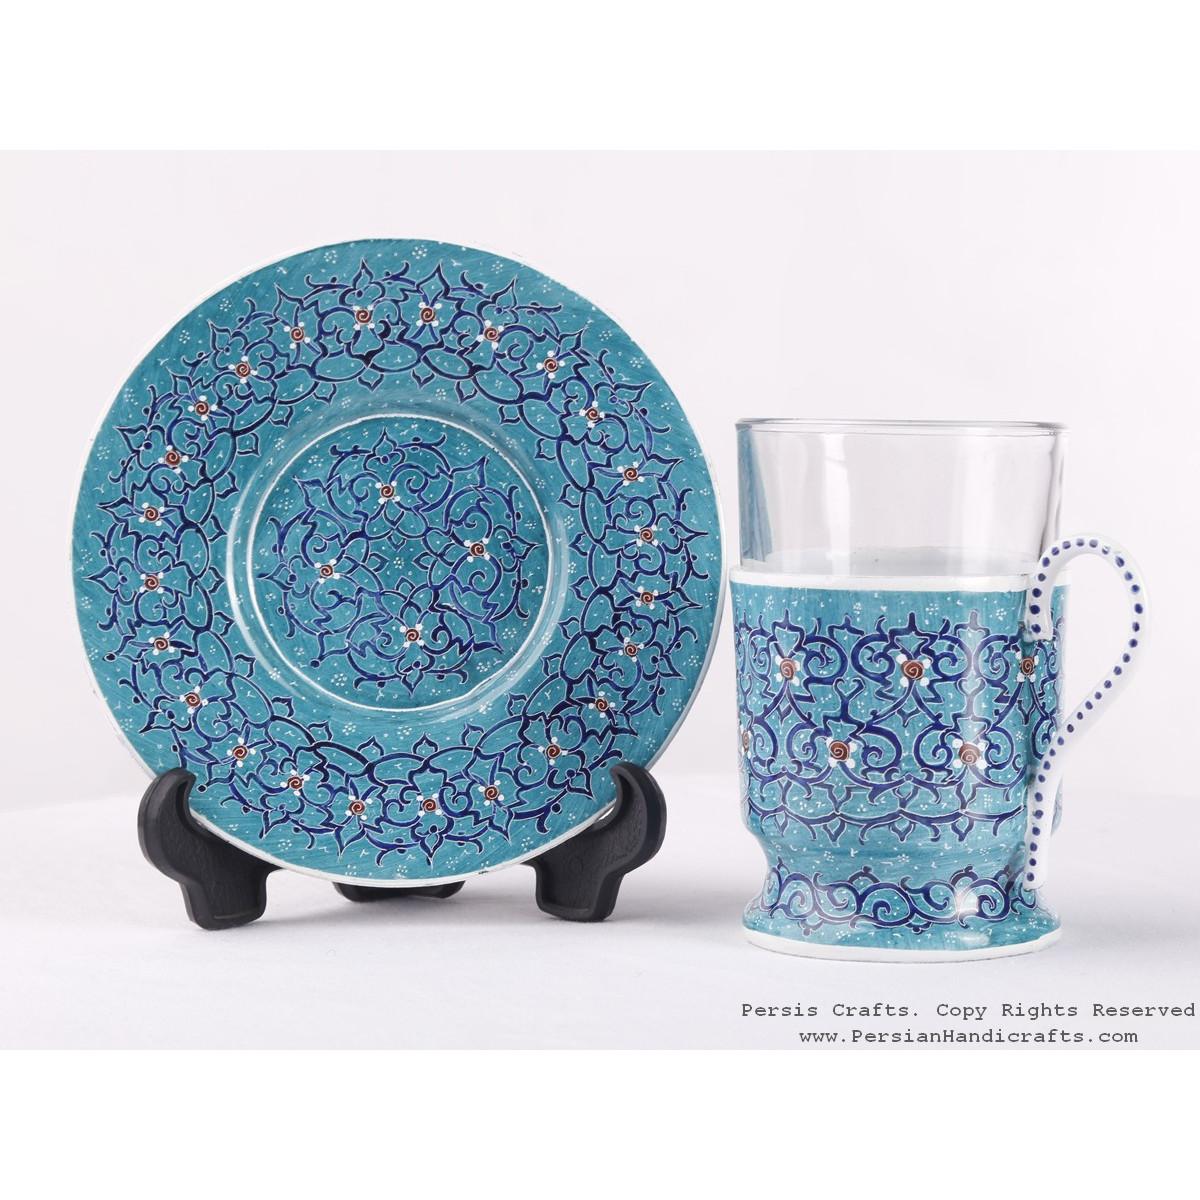 Enamel (Minakari) Tea Cup & Saucer - HE3603-Persian Handicrafts